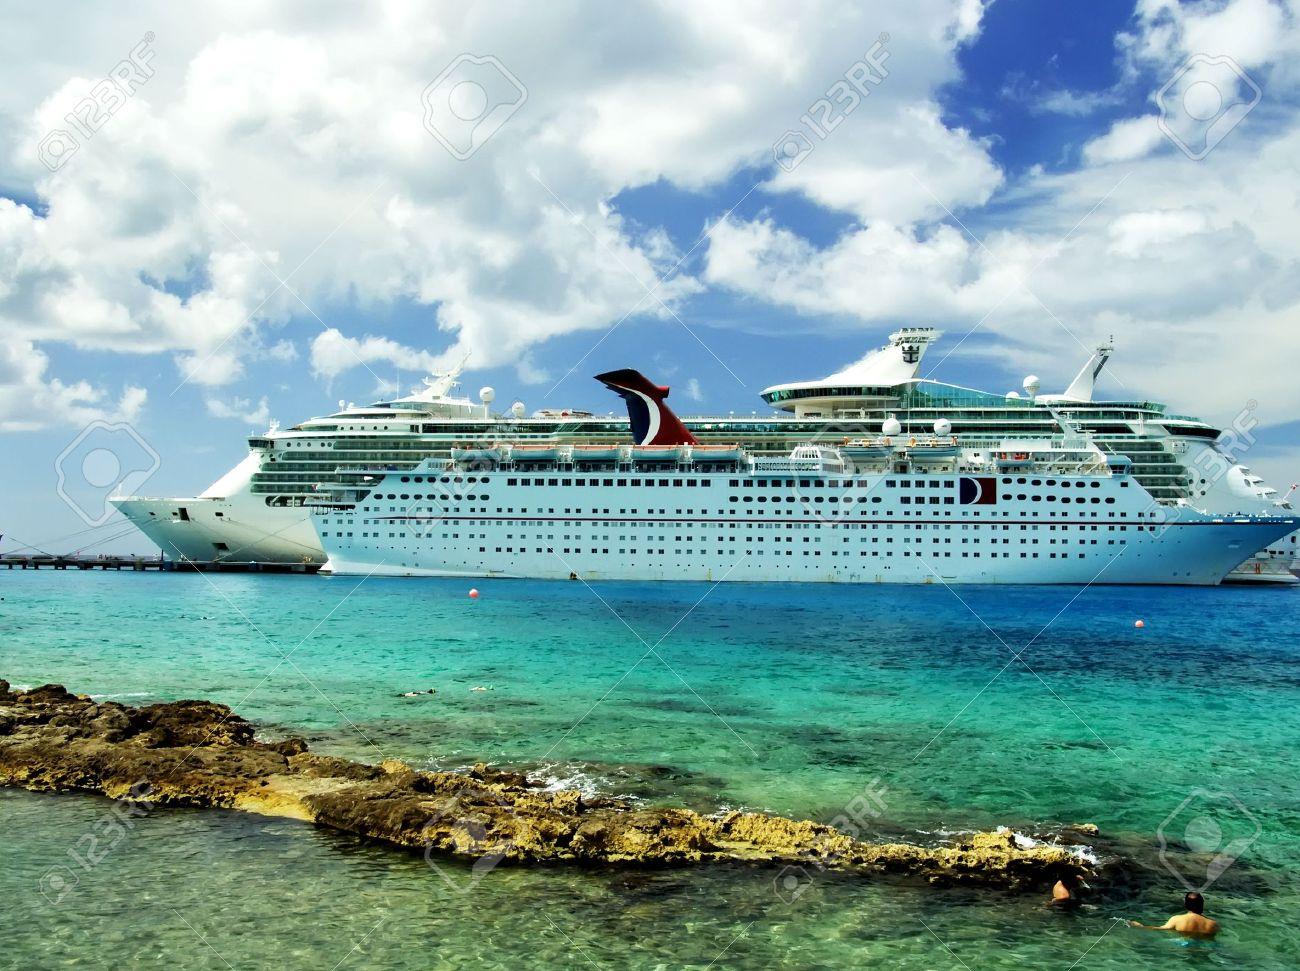 Luxury Vacation: Cruise Ships. Caribbean Sea, Cozumel, Mexico - 2743746